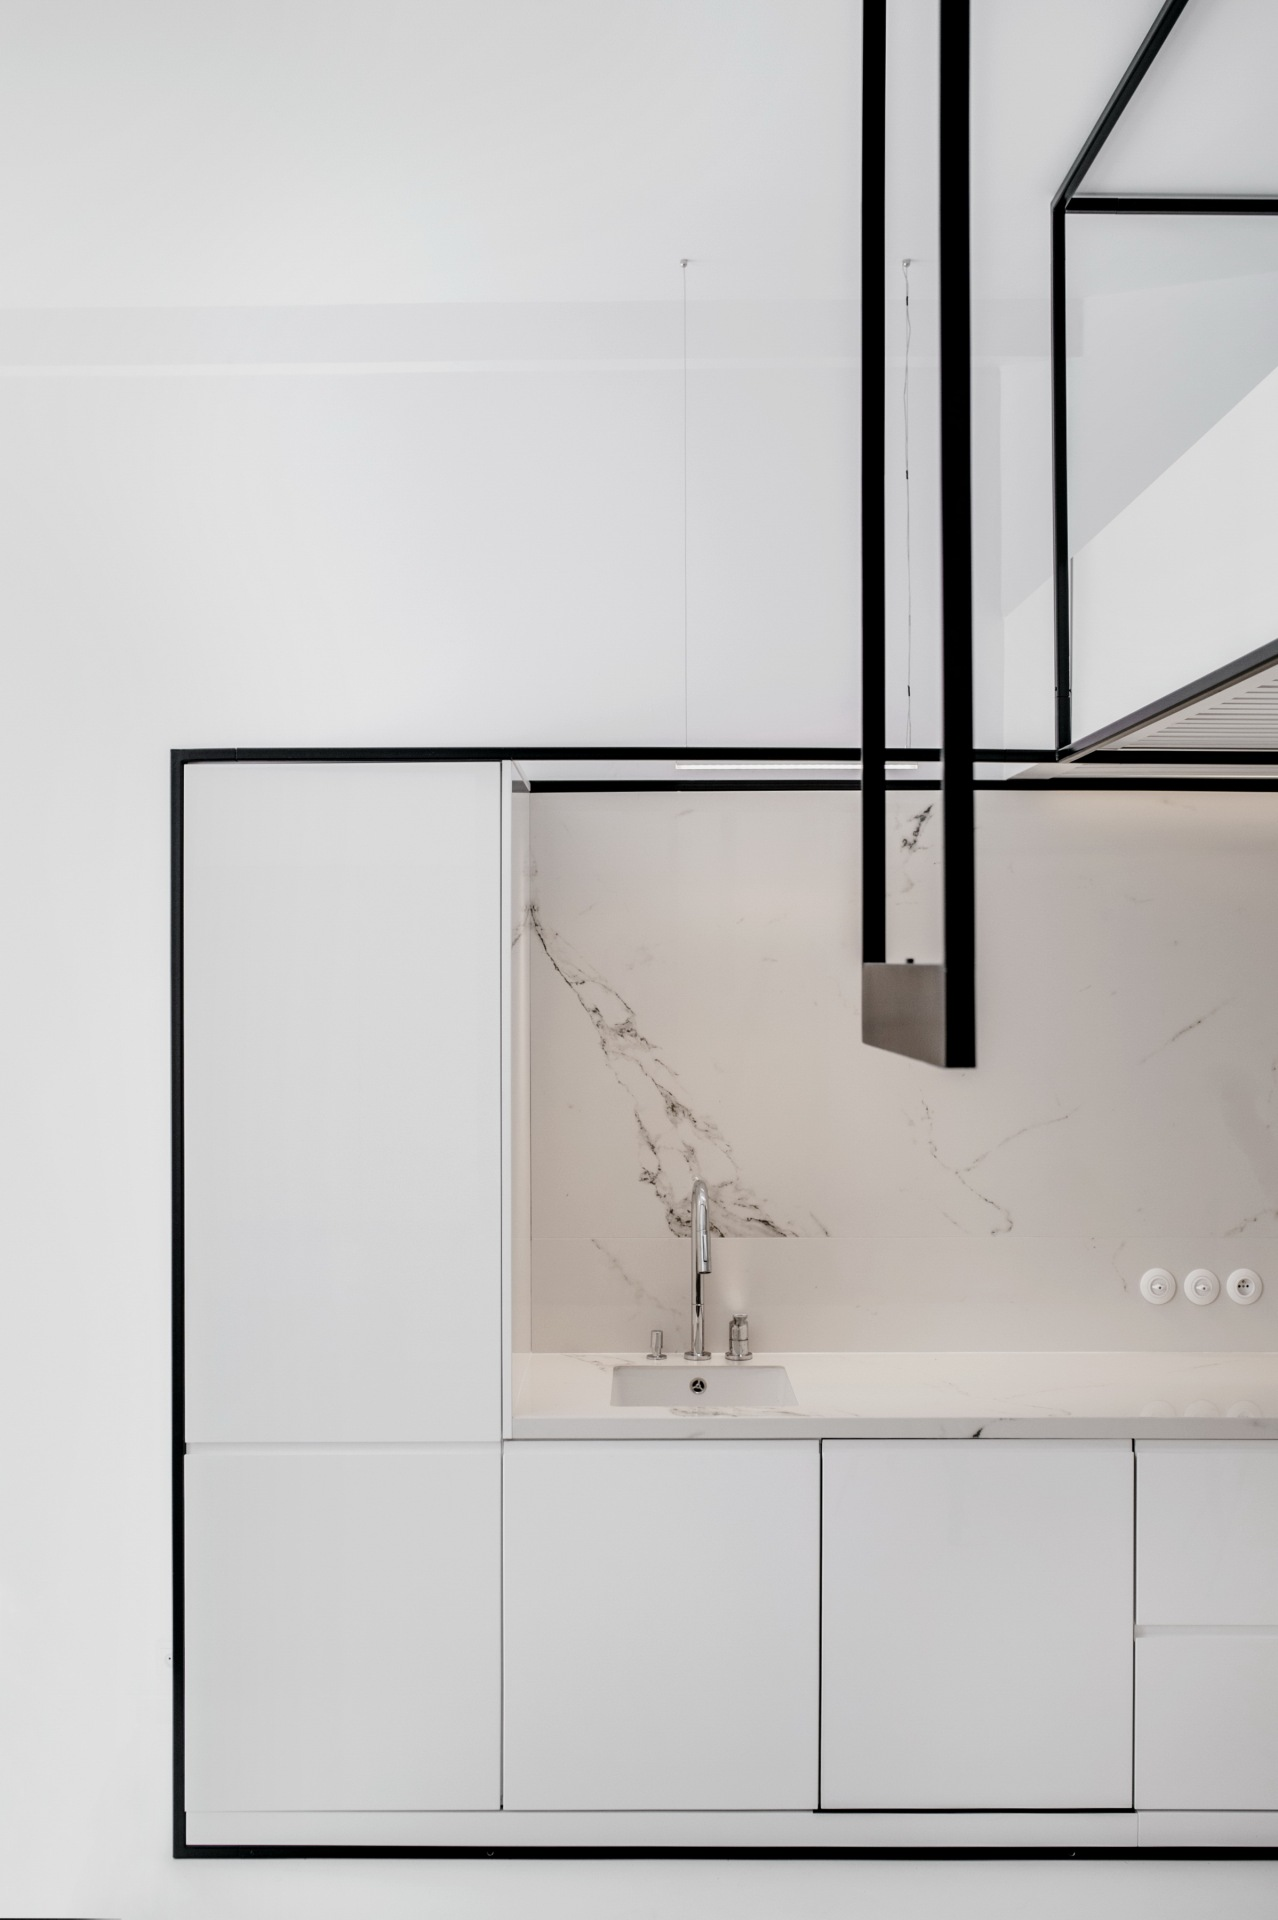 mus_architects_designalive-4